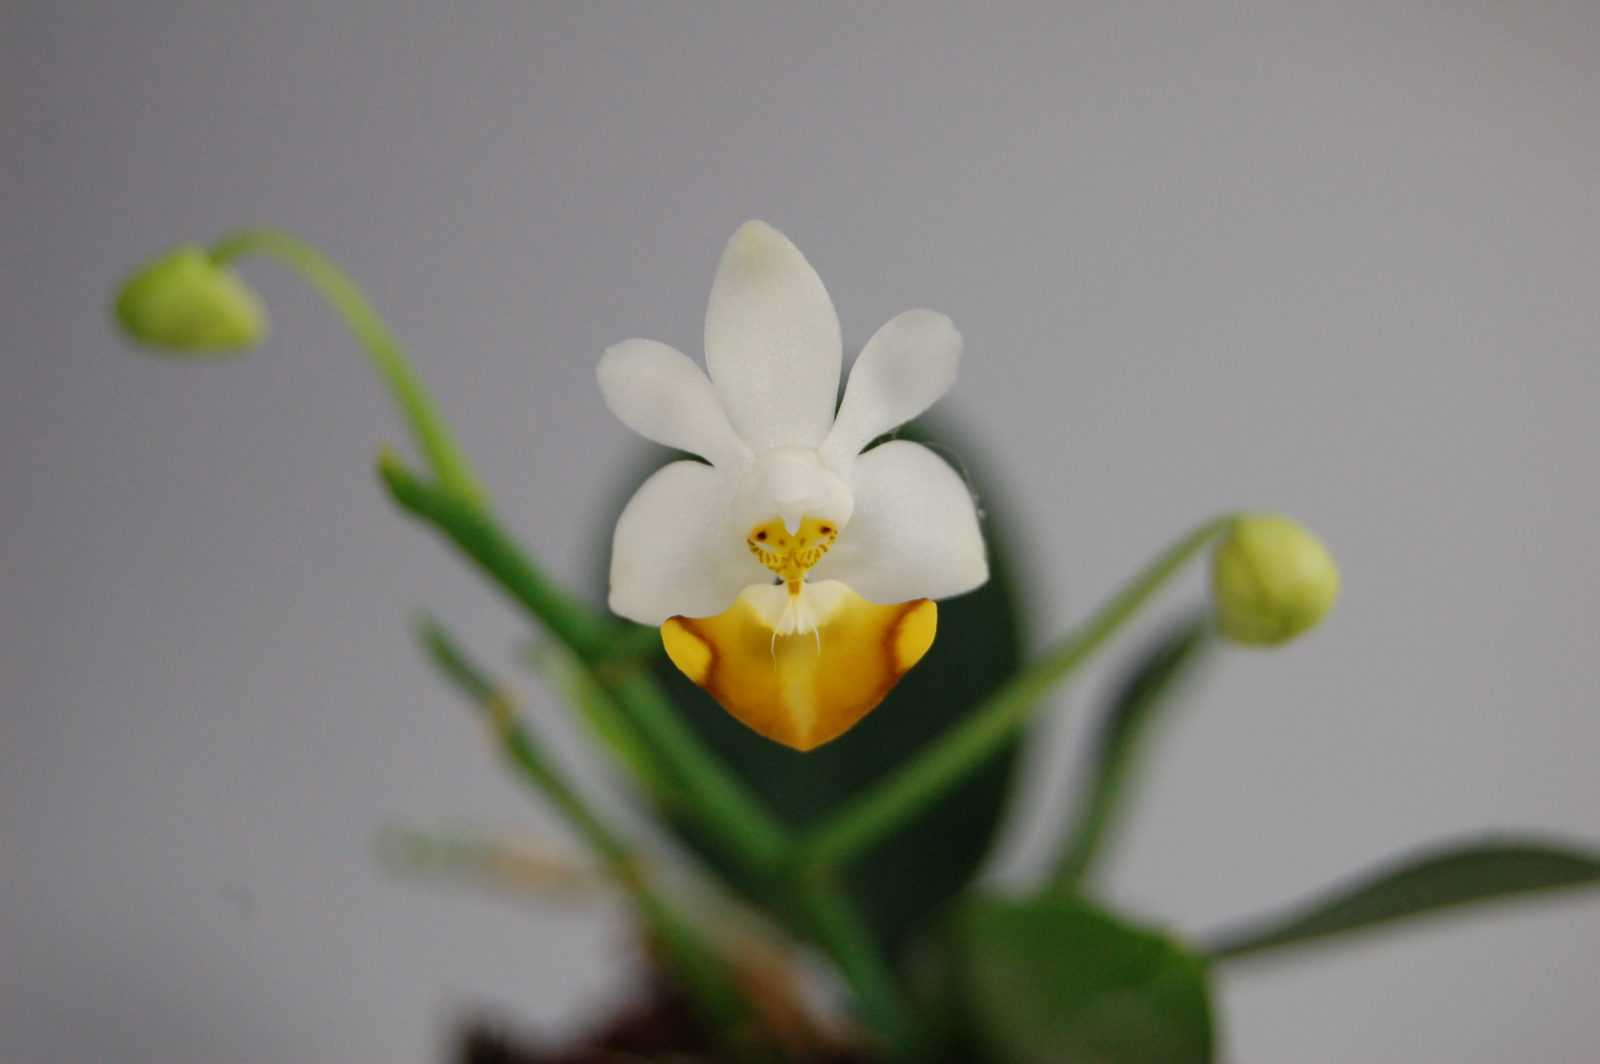 orhideya-falenopsis-foto-video-vidyi-falenopsis-harakteristika-i-opisanie-32